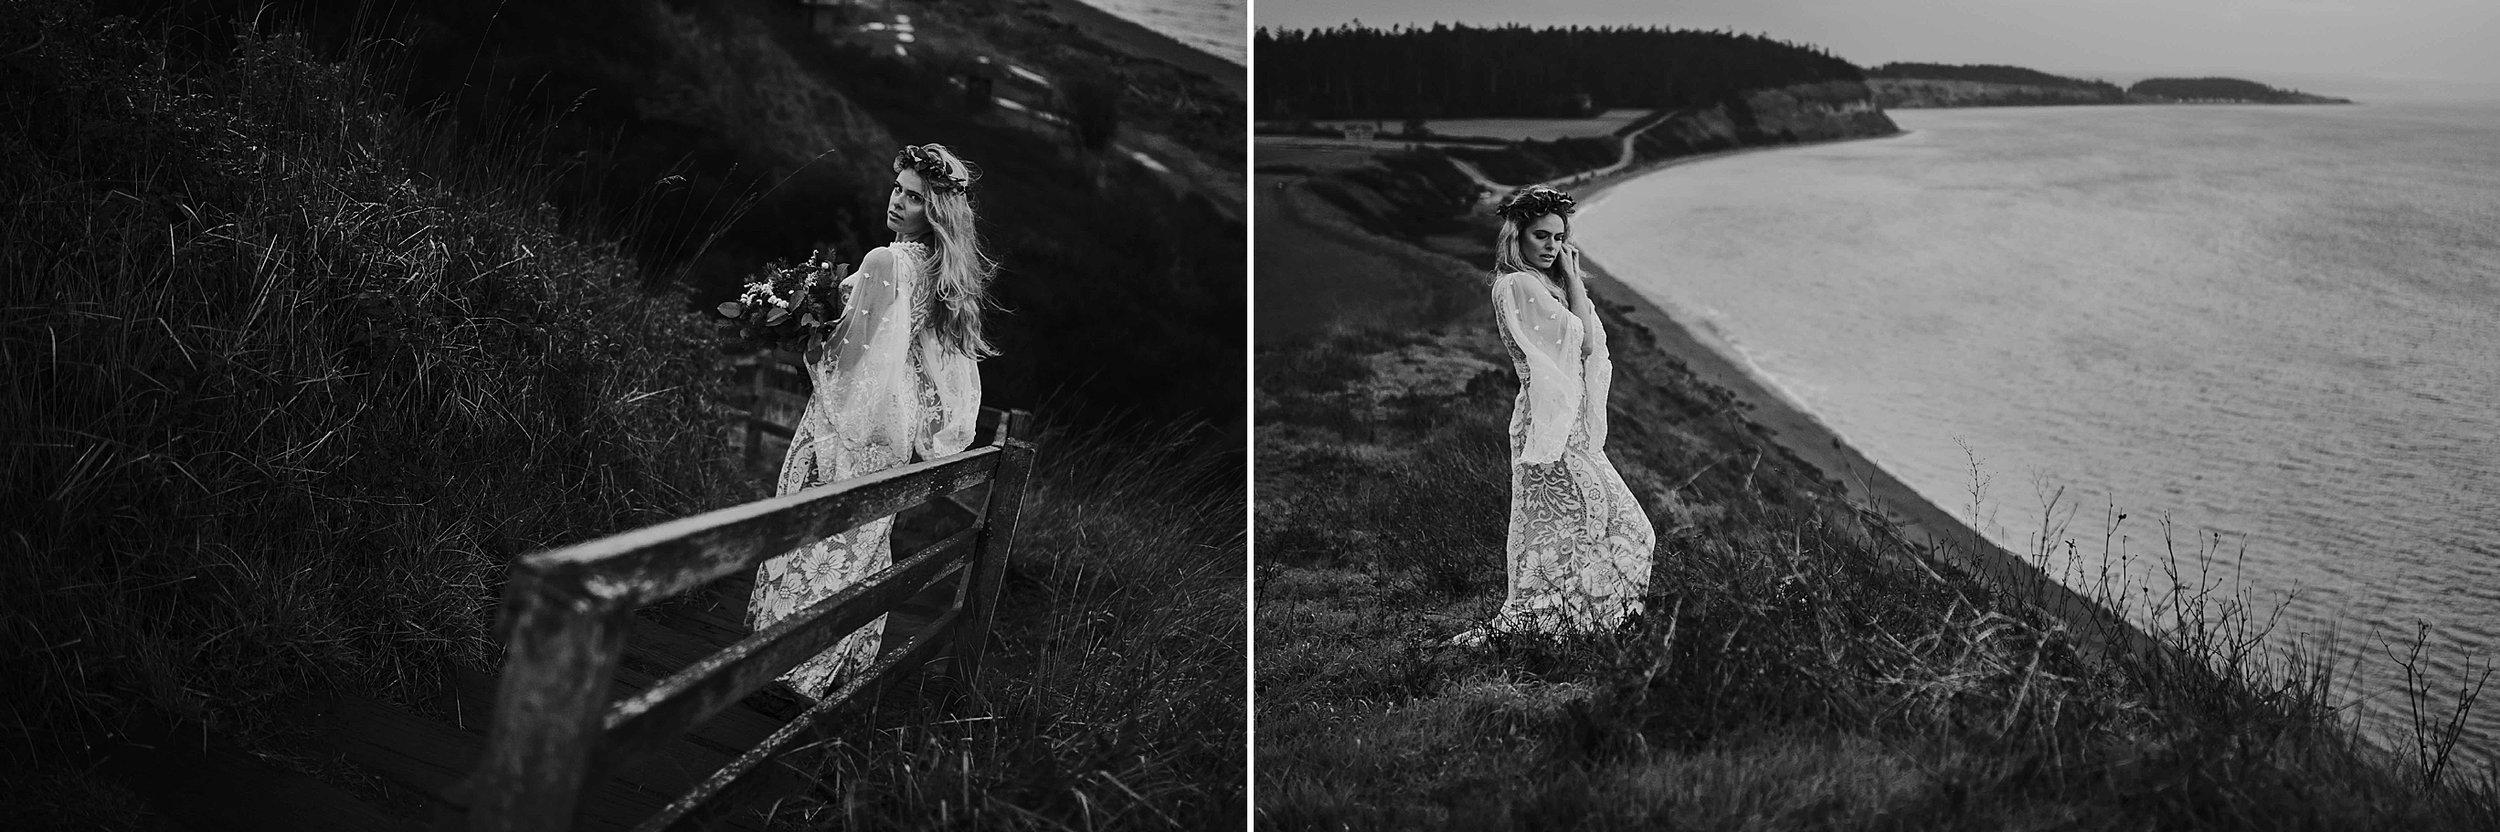 Wedding-photographer-J HODGES PHOTOGRAPHY_0226.jpg